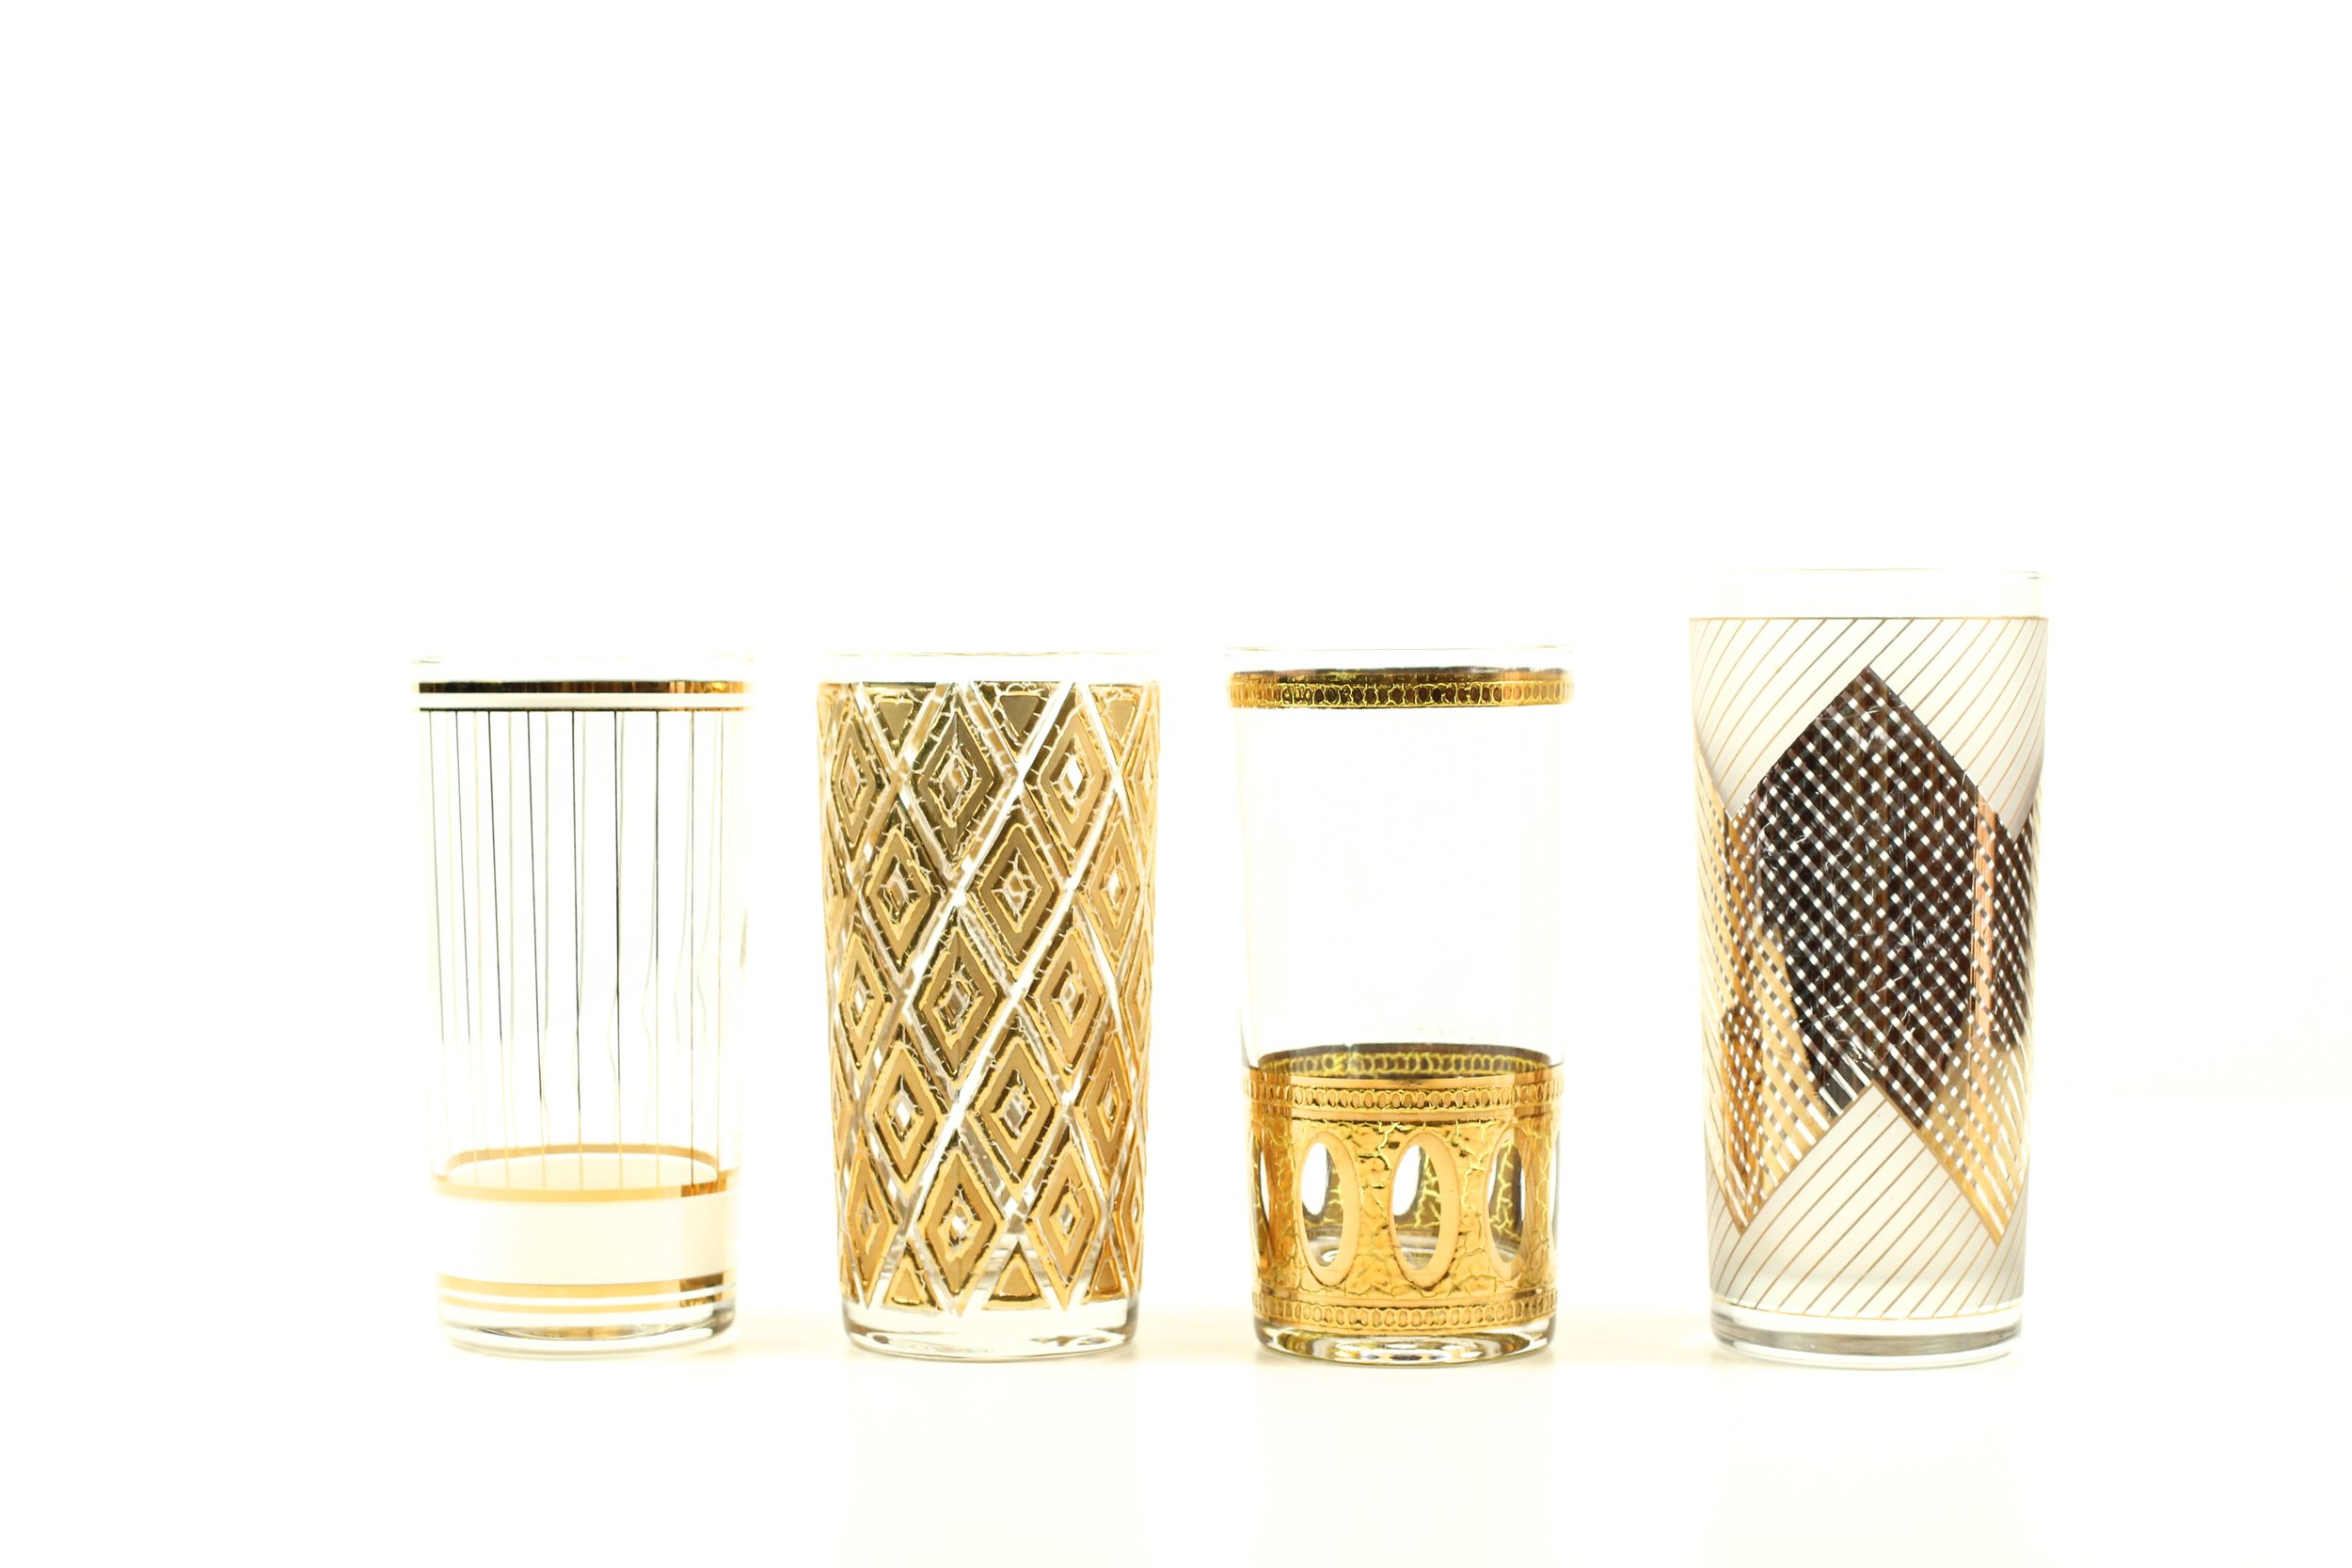 Vintage Tumbler Glasses With Gold Detailing